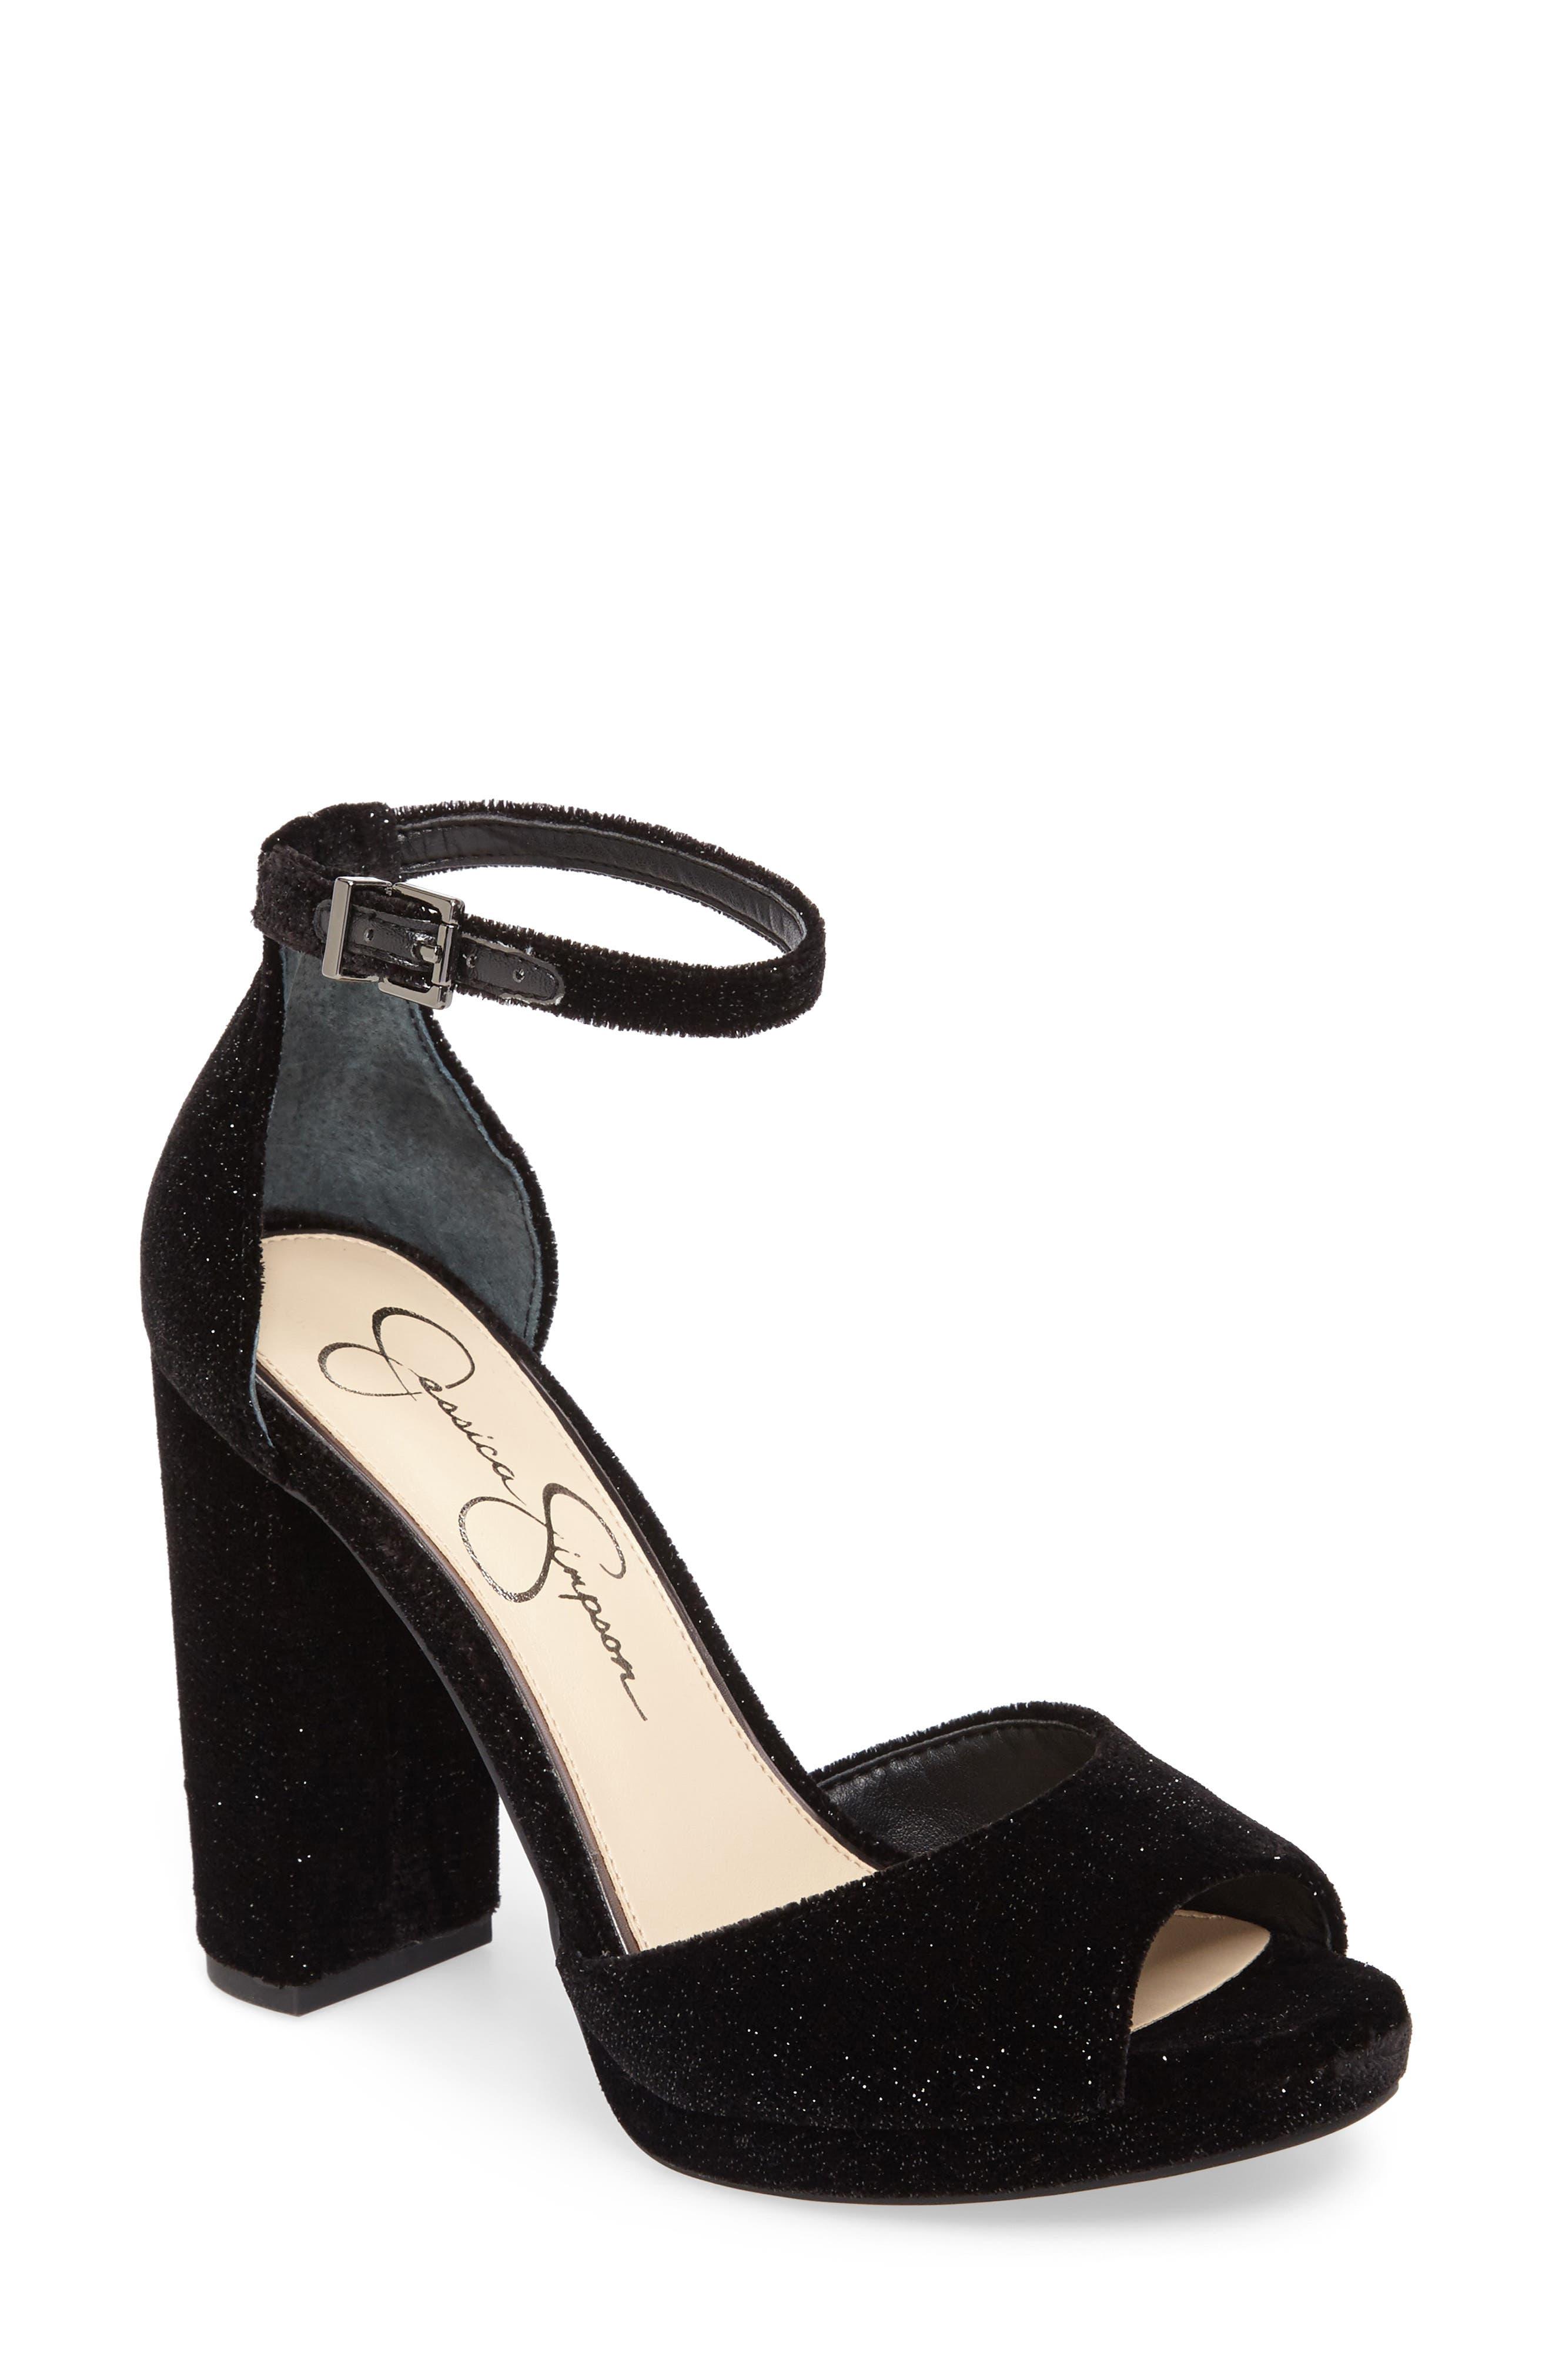 Jenee Platform Sandal,                             Main thumbnail 1, color,                             001